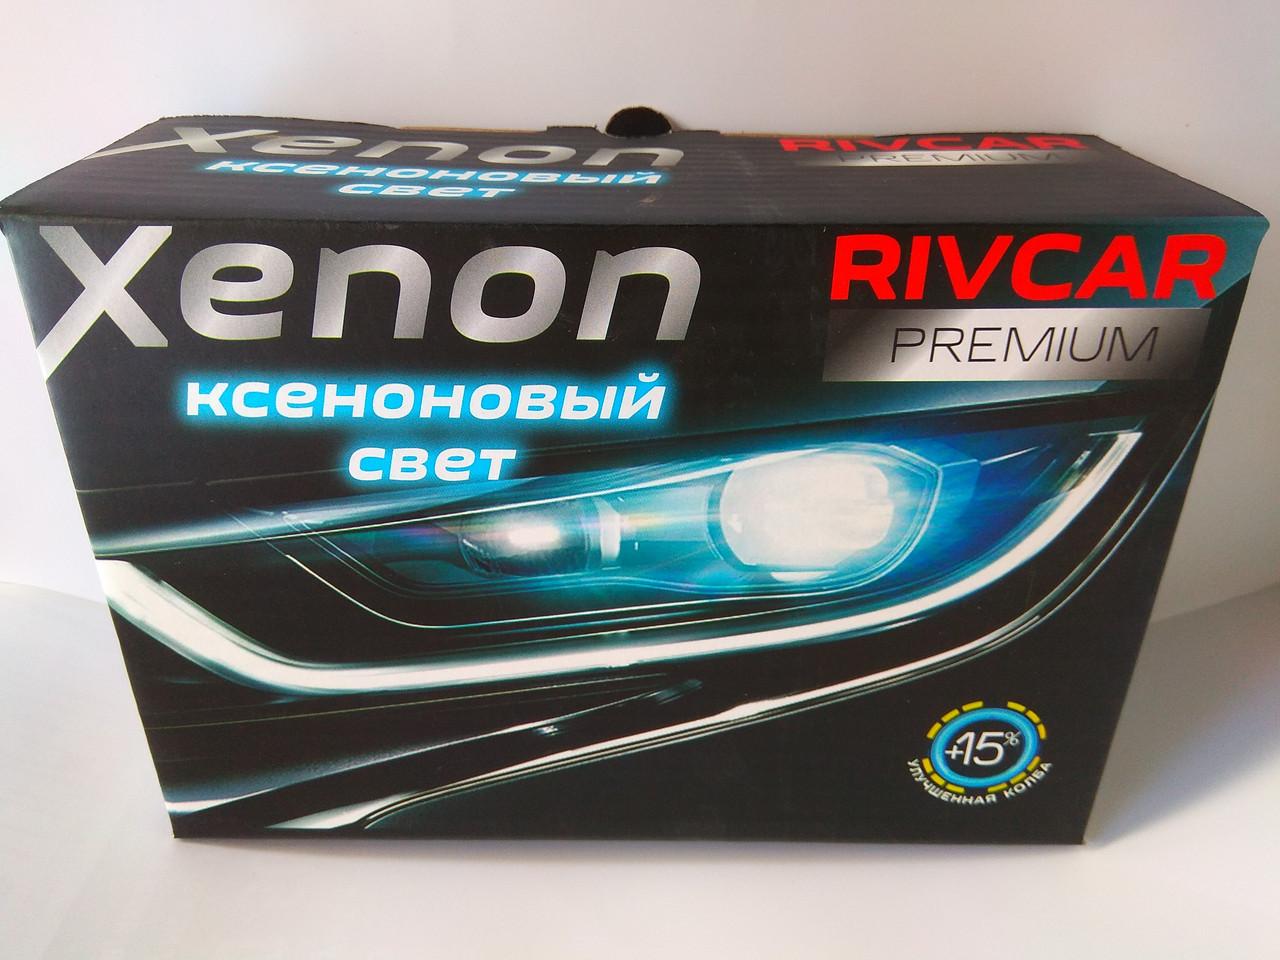 Ксенон Rivcar premium 24v H1 4300k